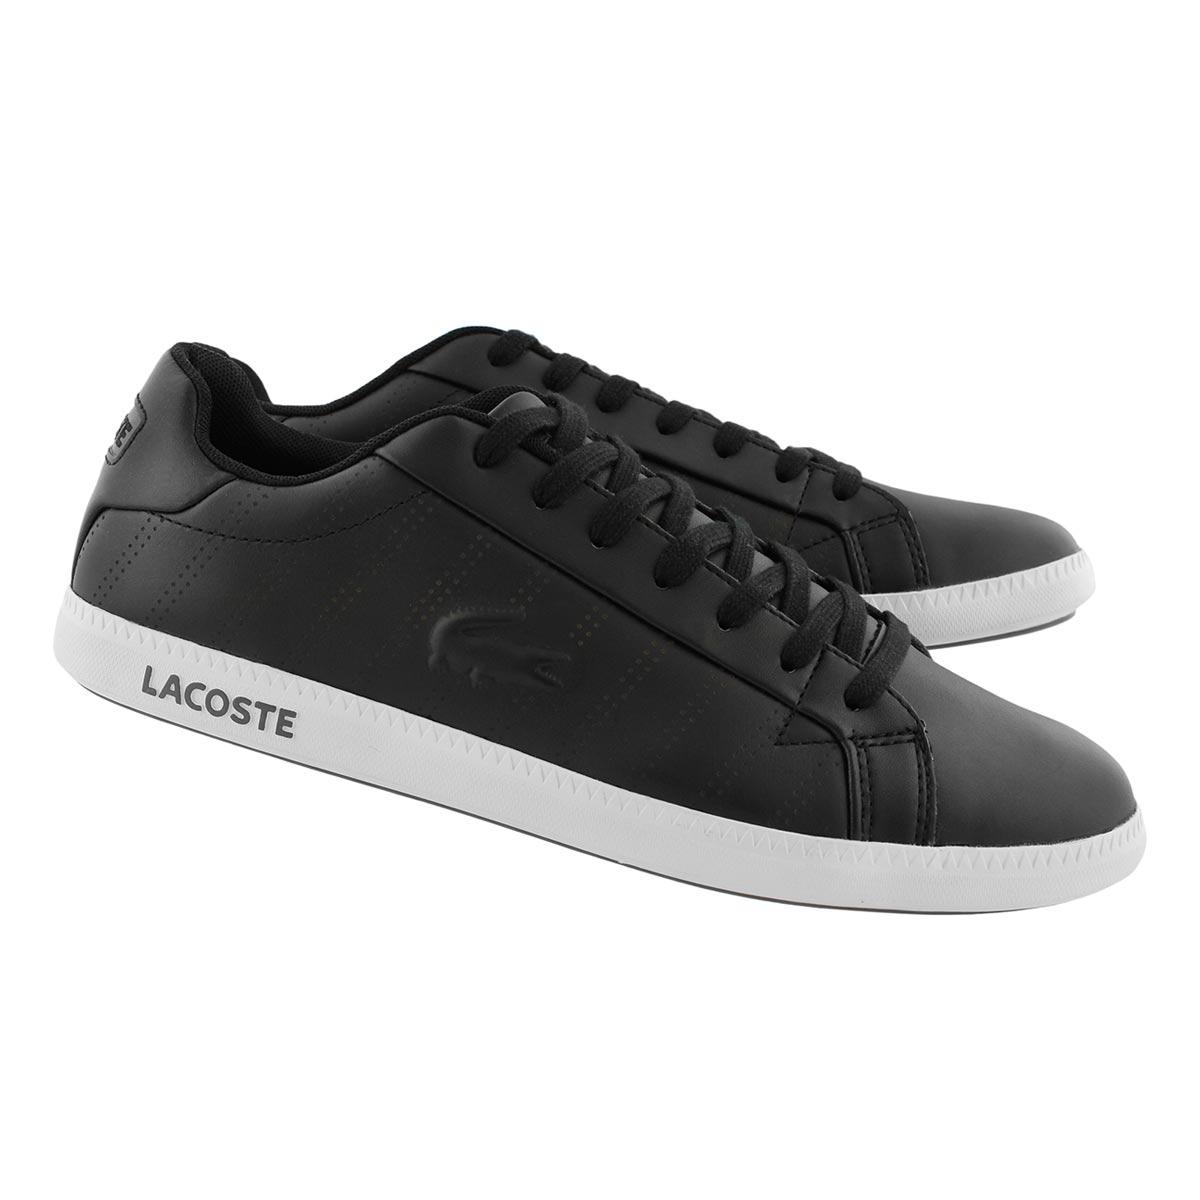 Mns Graduate 318 1 blk/gry sneaker